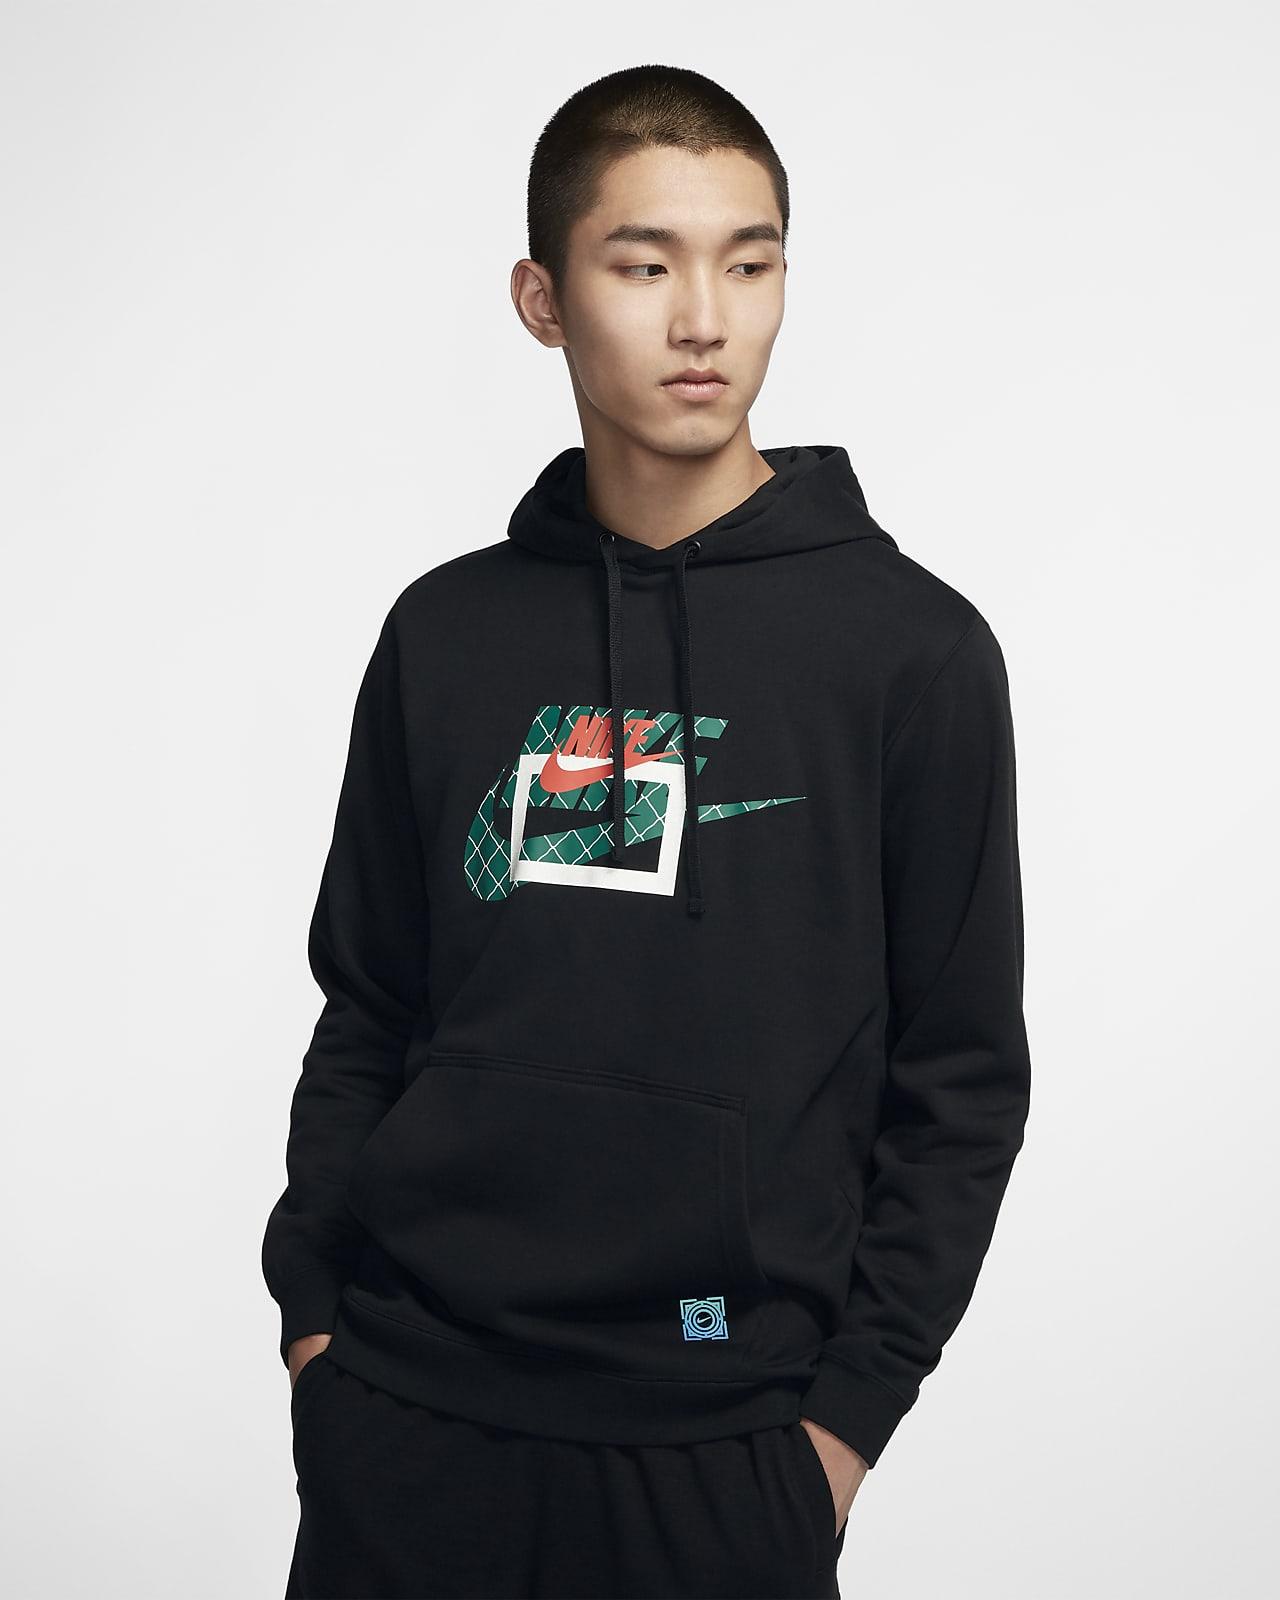 Nike Sportswear 男子套头连帽衫